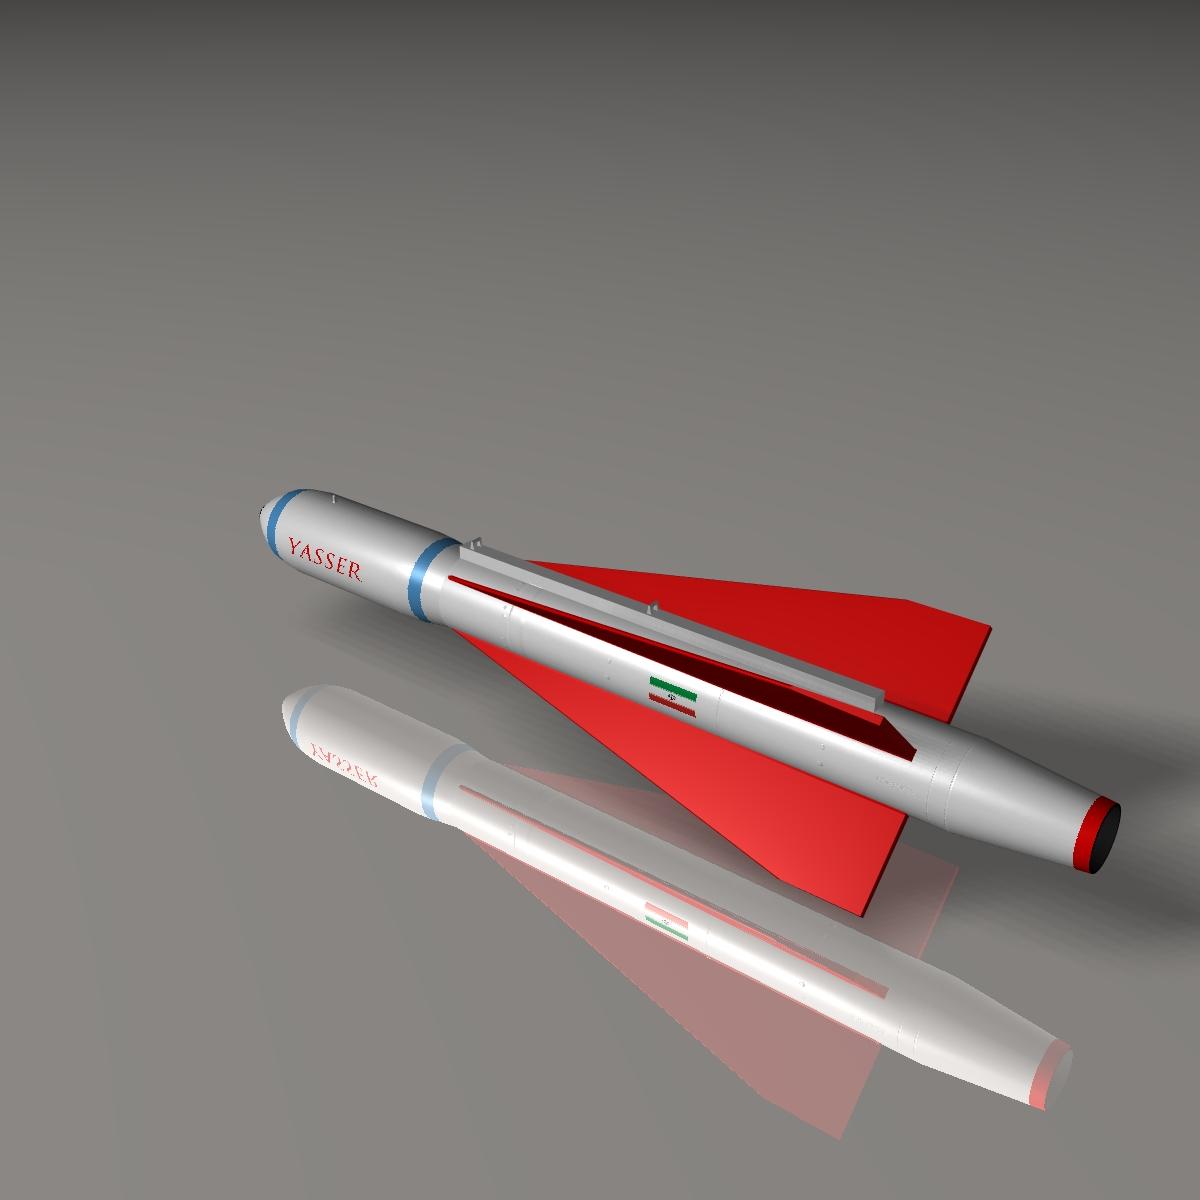 iran yasser asm raketi 3d modeli 3ds dxf cob x obj 150573